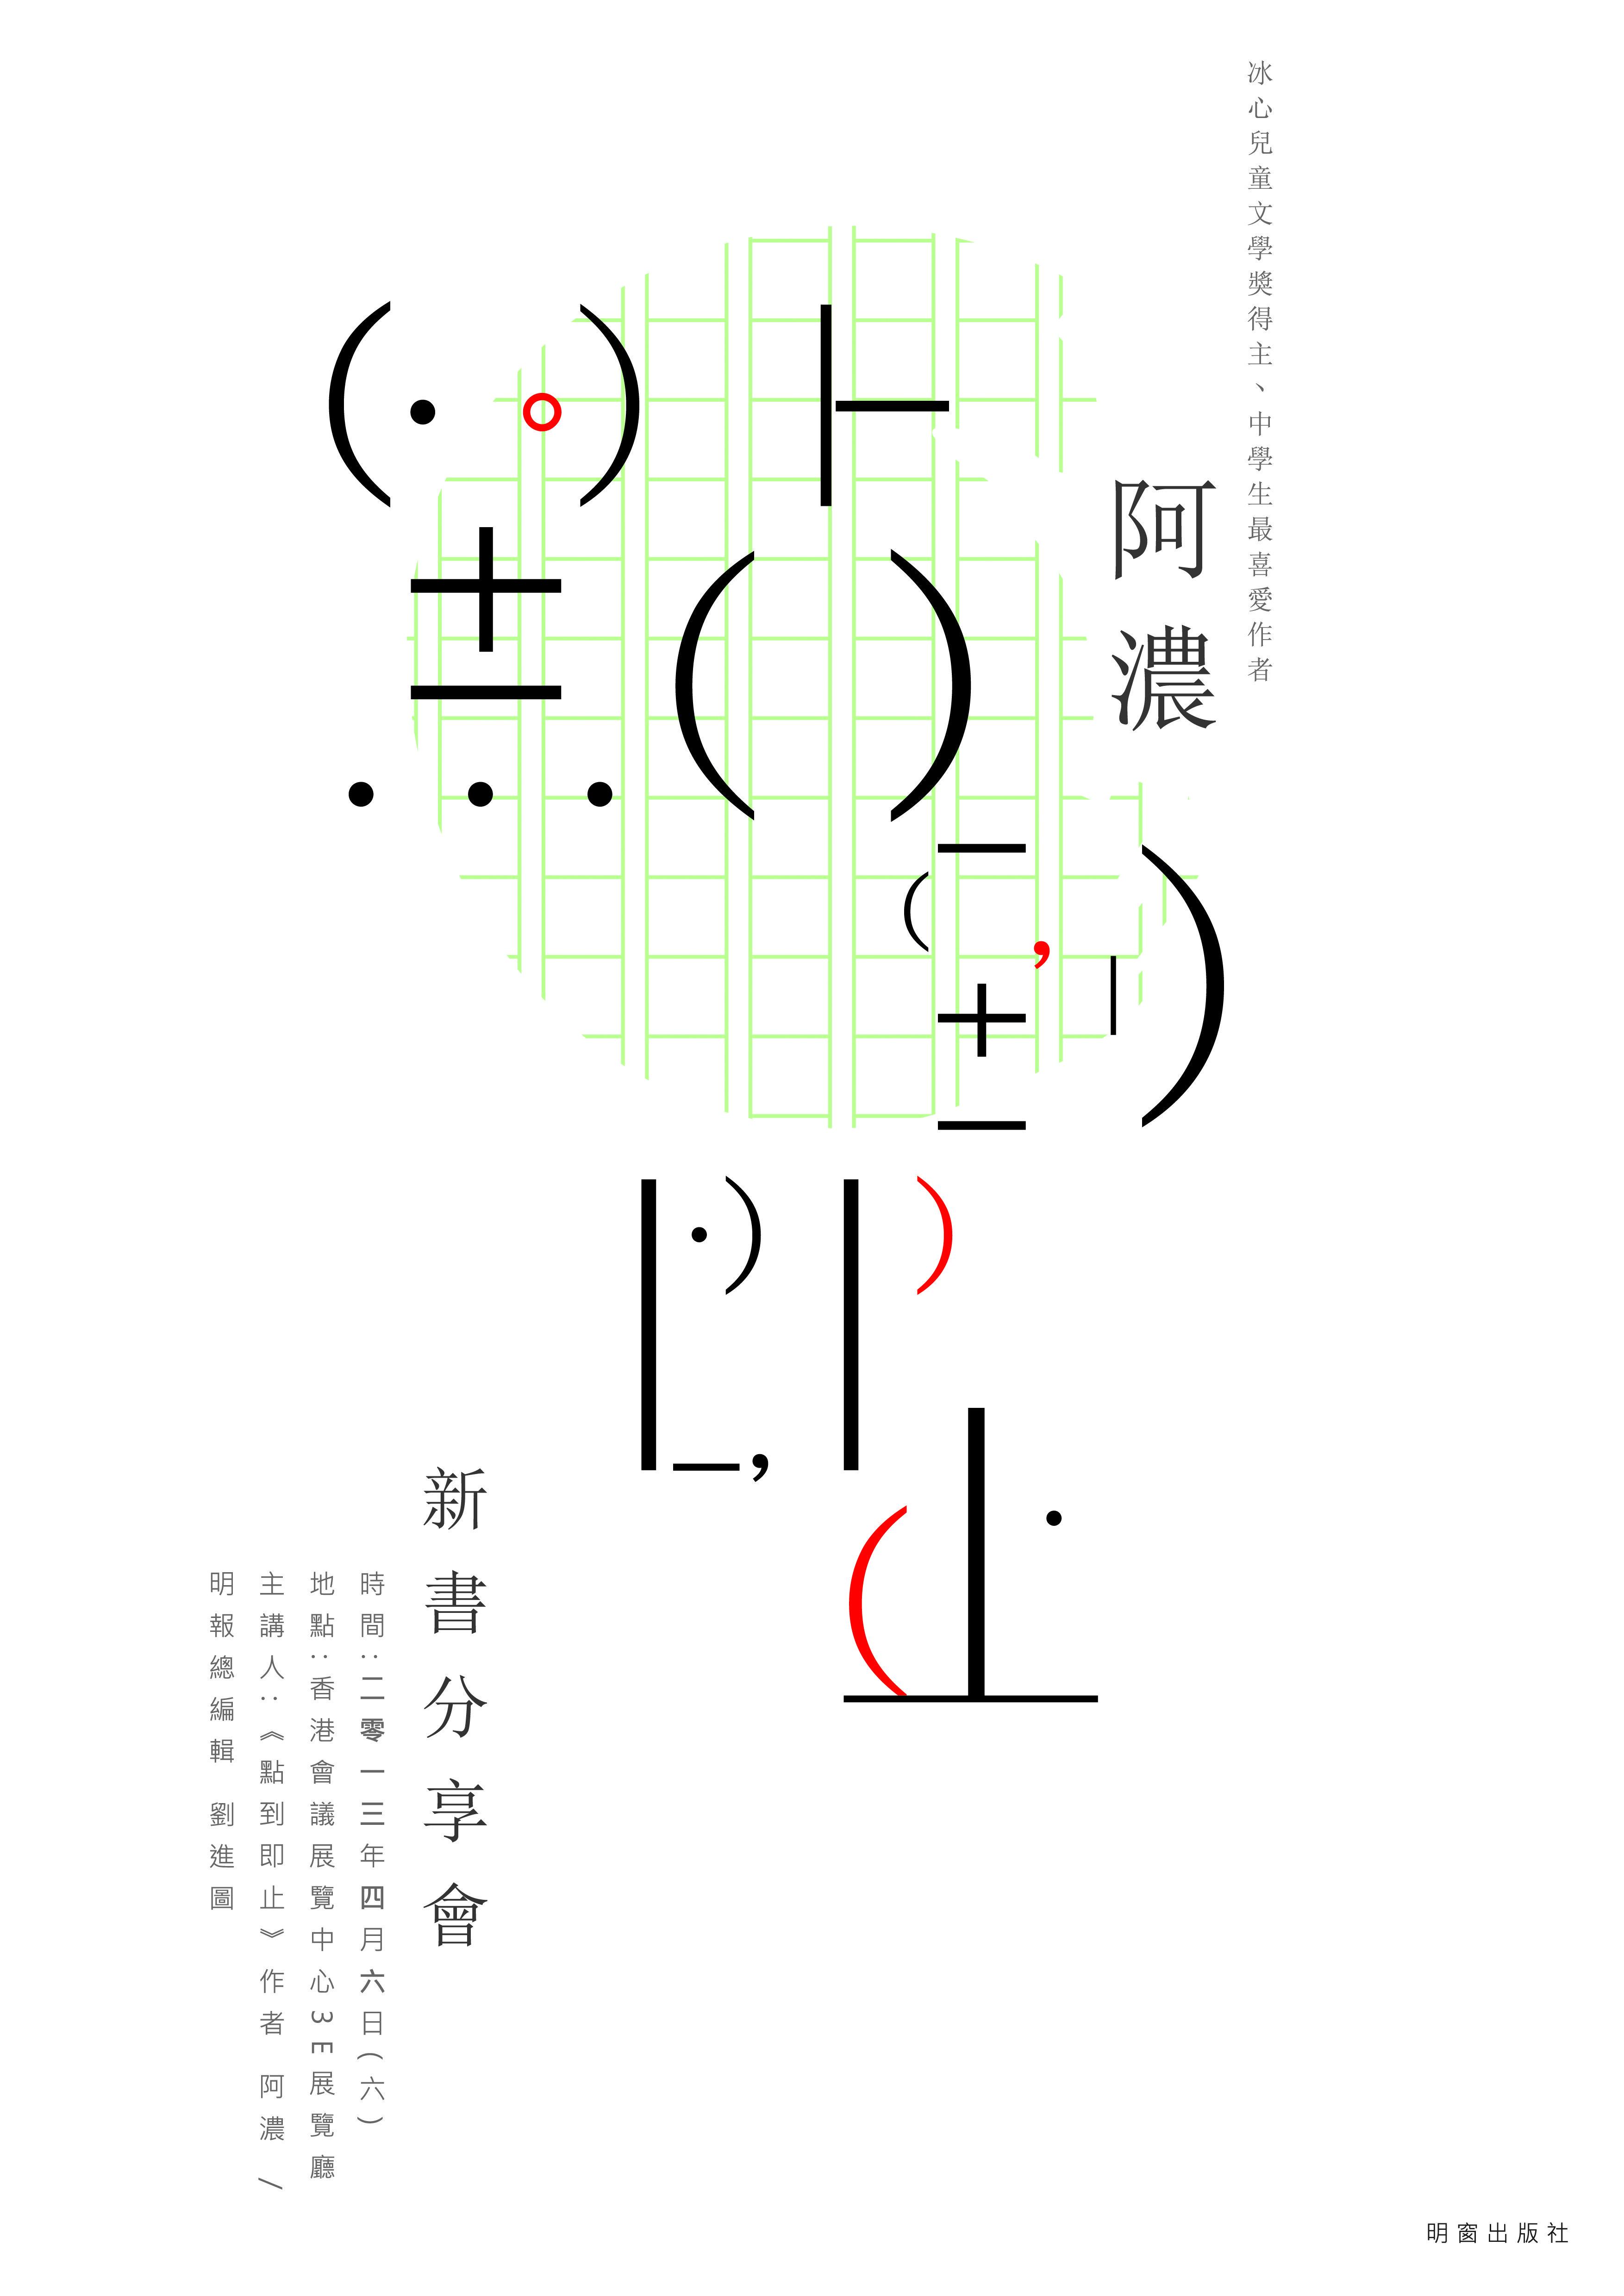 Sze S Board おしゃれまとめの人気アイデア Pinterest Patricia Romero レタリングデザイン タイポグラフィー ポスターデザイン